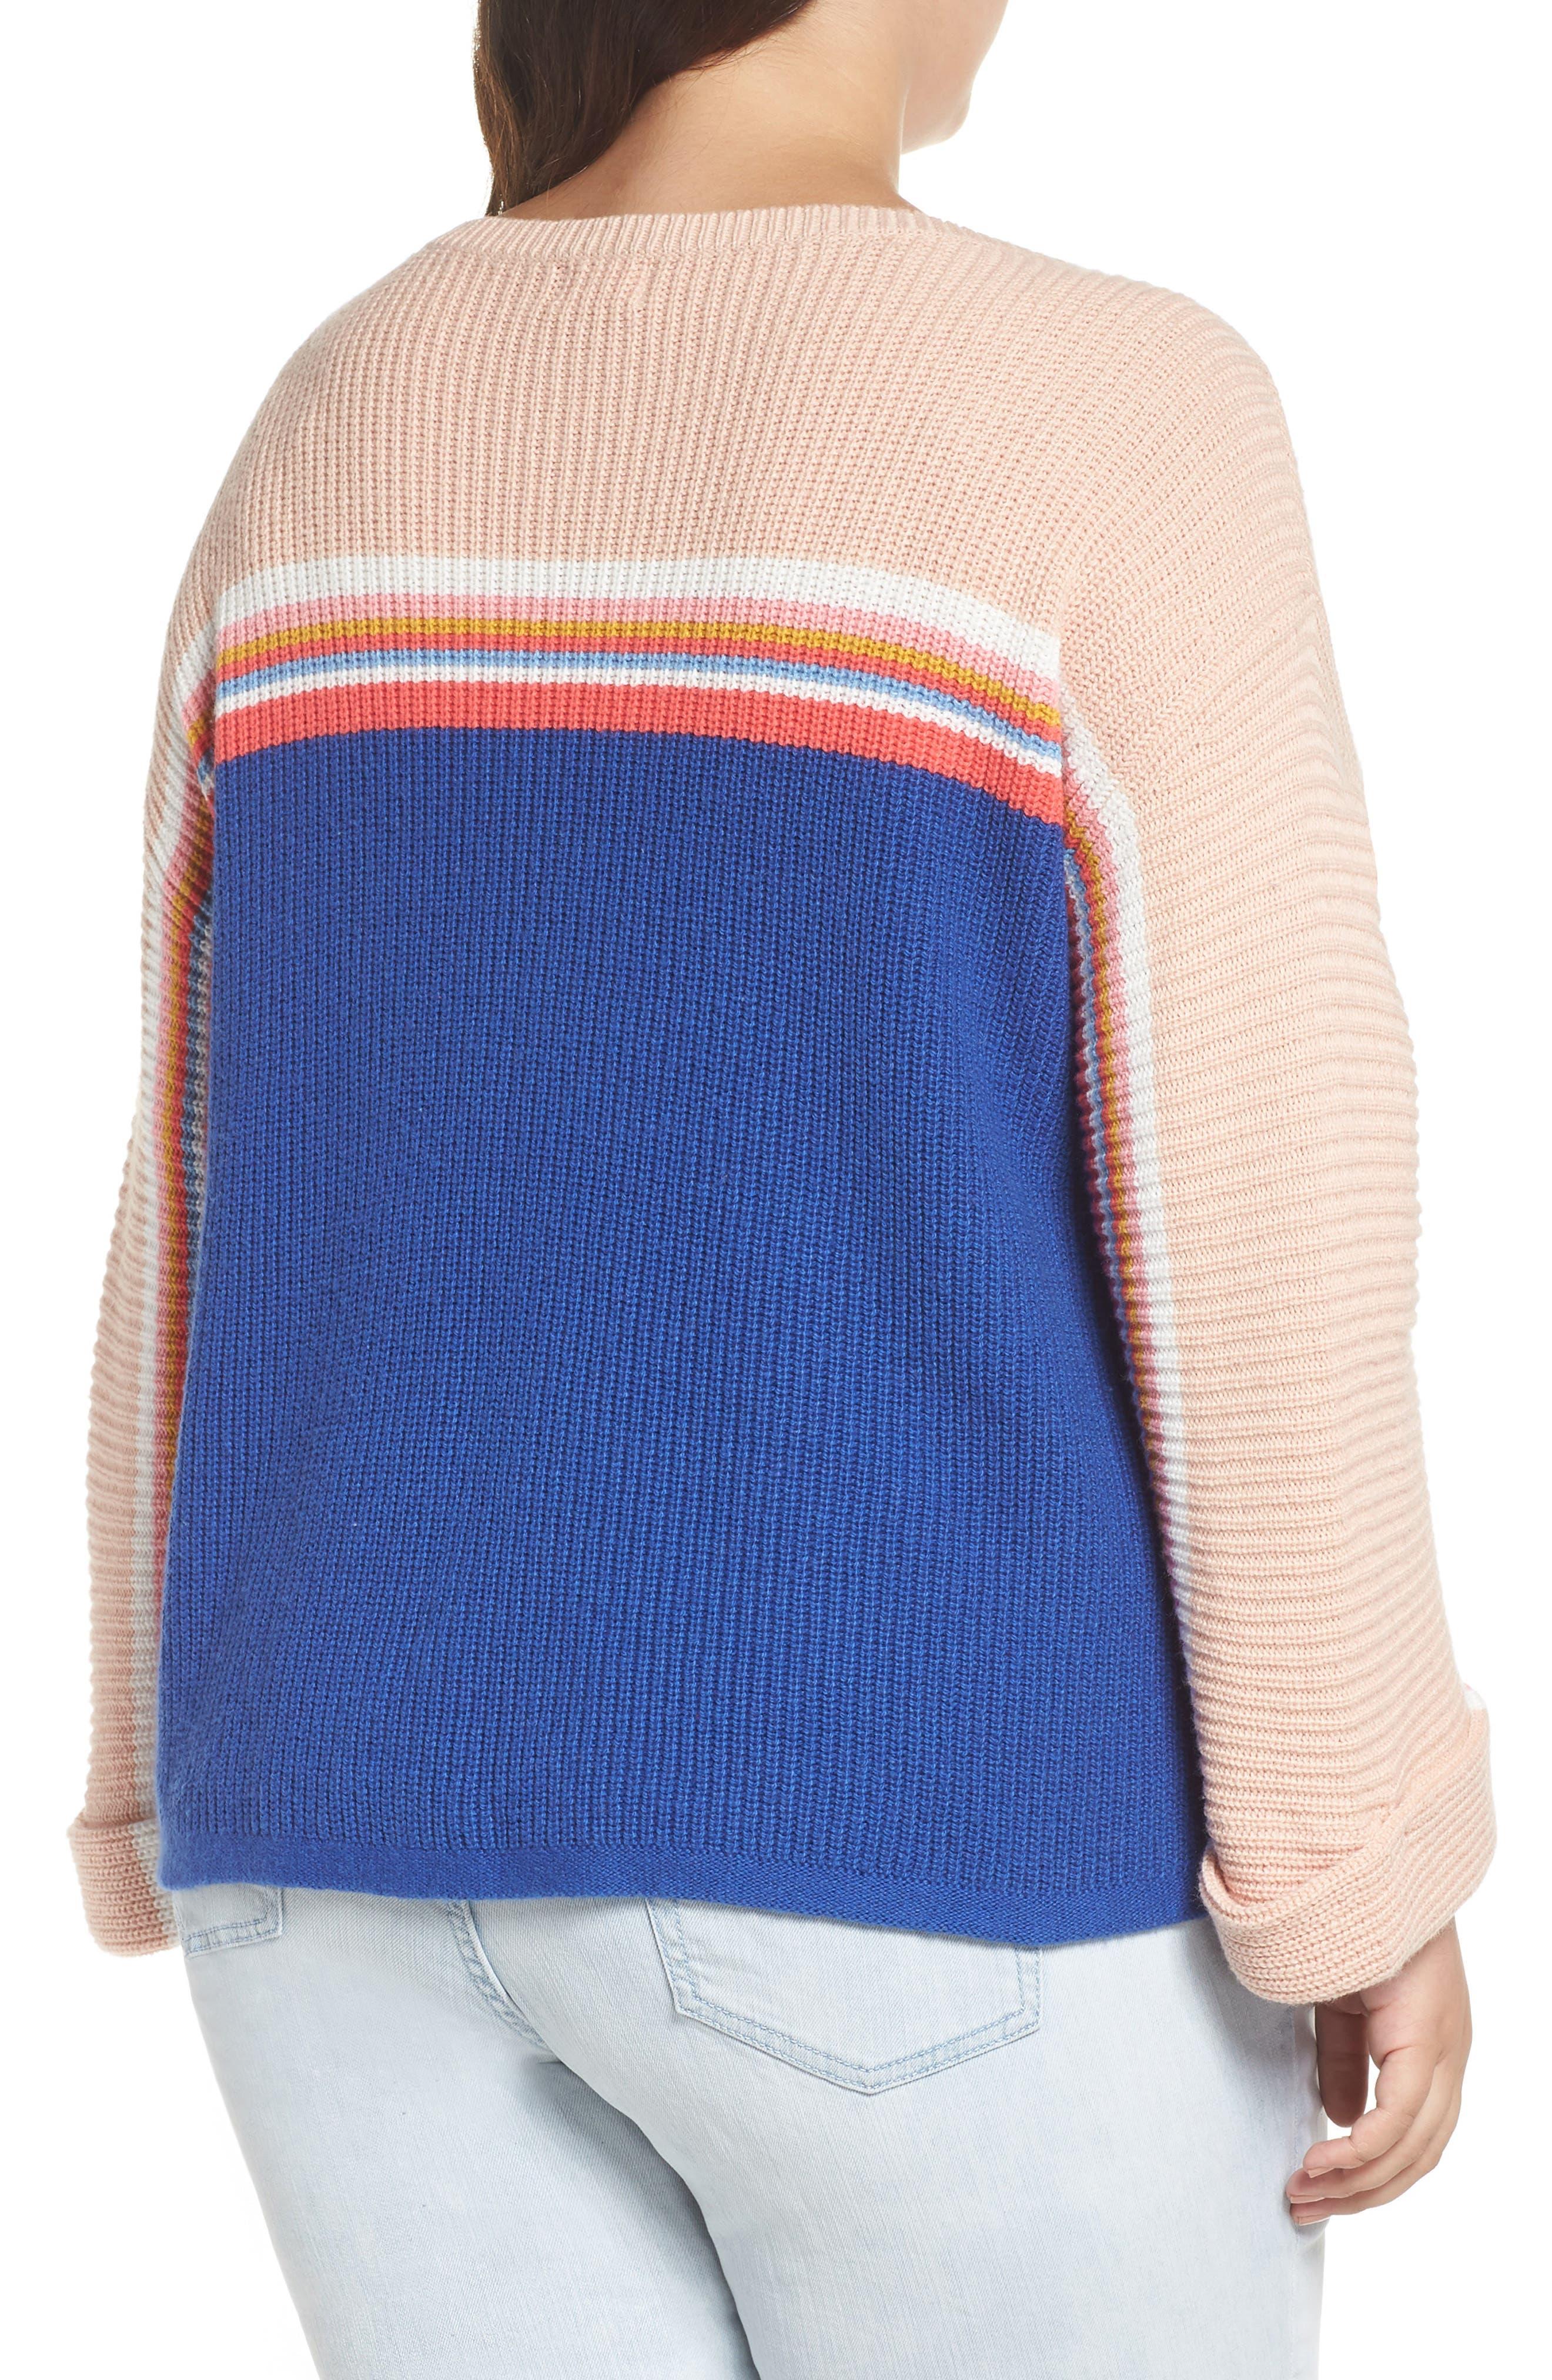 Shaker Stitch Sweater,                             Alternate thumbnail 2, color,                             401